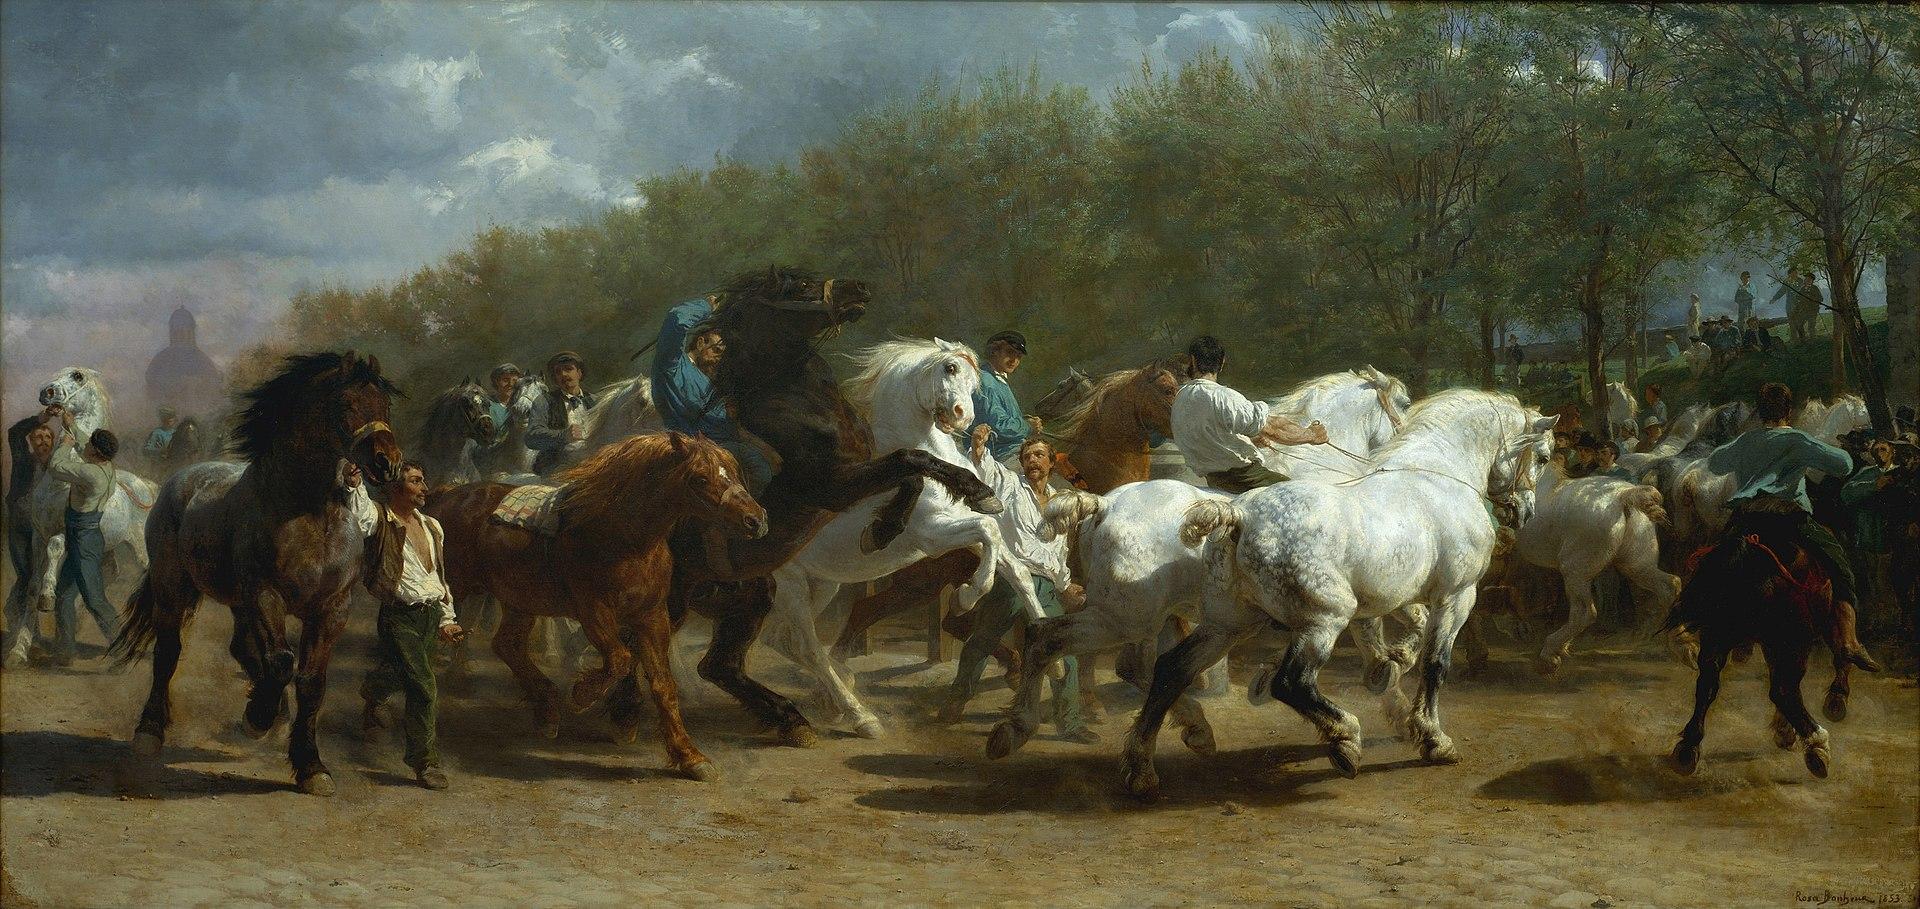 Rosa Bonheur, The Horse Fair, 1852-55 © Metropolitan Museum of Art / Wikimedia Commons